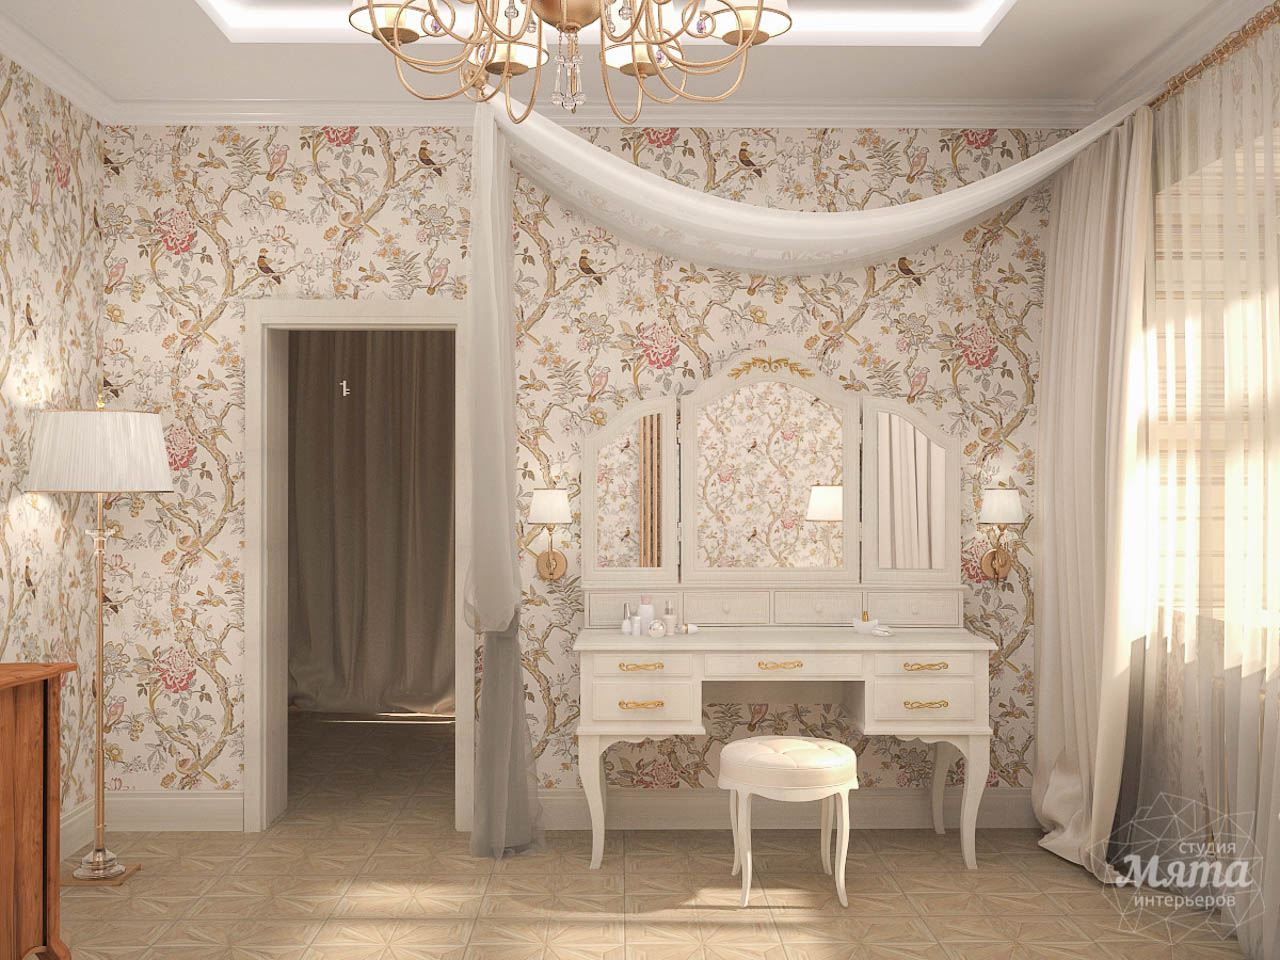 Дизайн интерьера коттеджа по ул. Ландышевая 23 img647392514